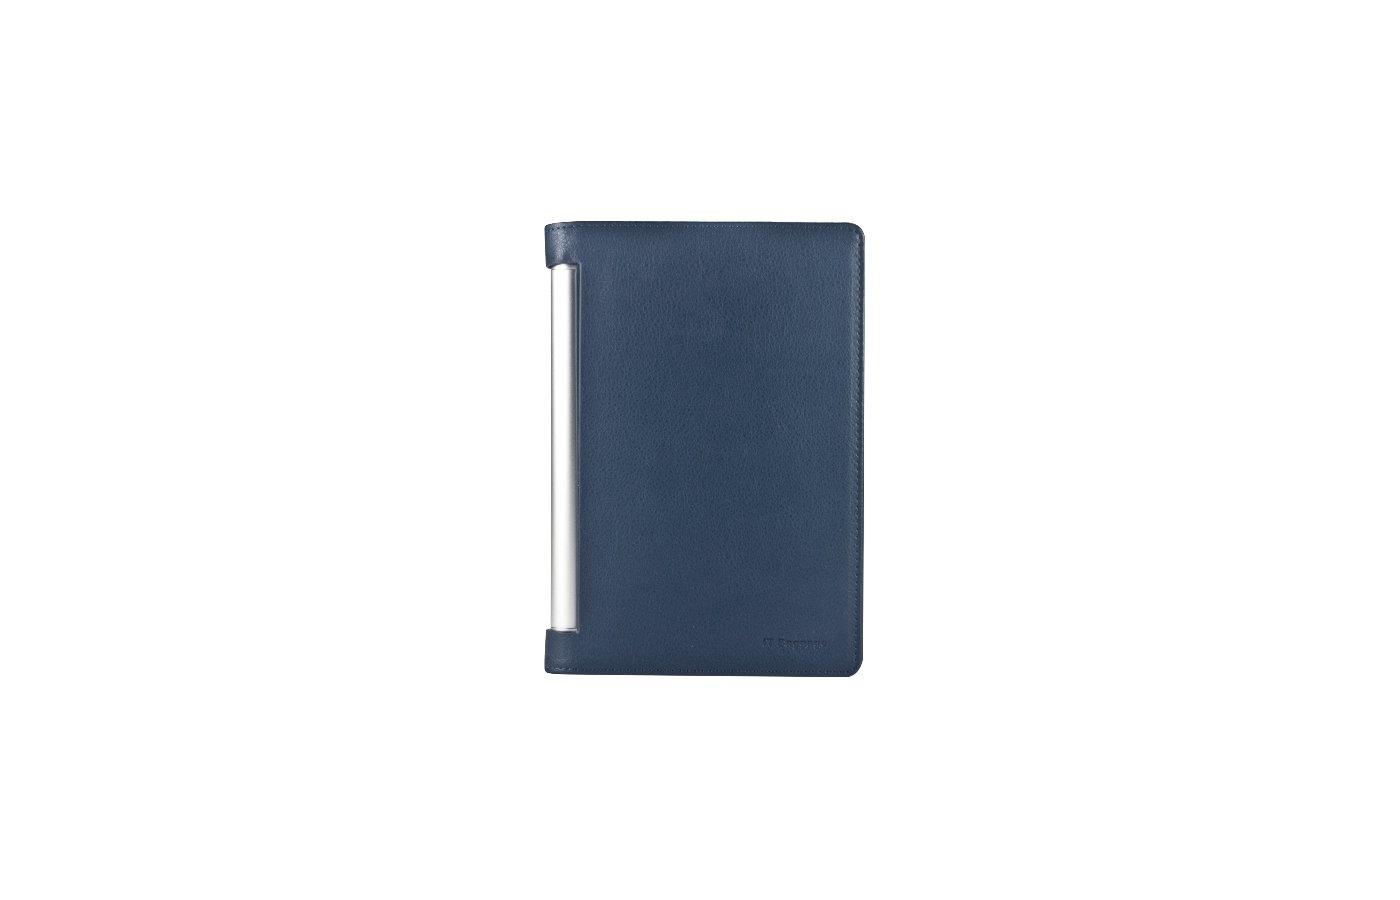 Чехол для планшетного ПК IT BAGGAGE для LENOVO Yoga Tablet 2 10 искус. кожа синий ITLNY210-4